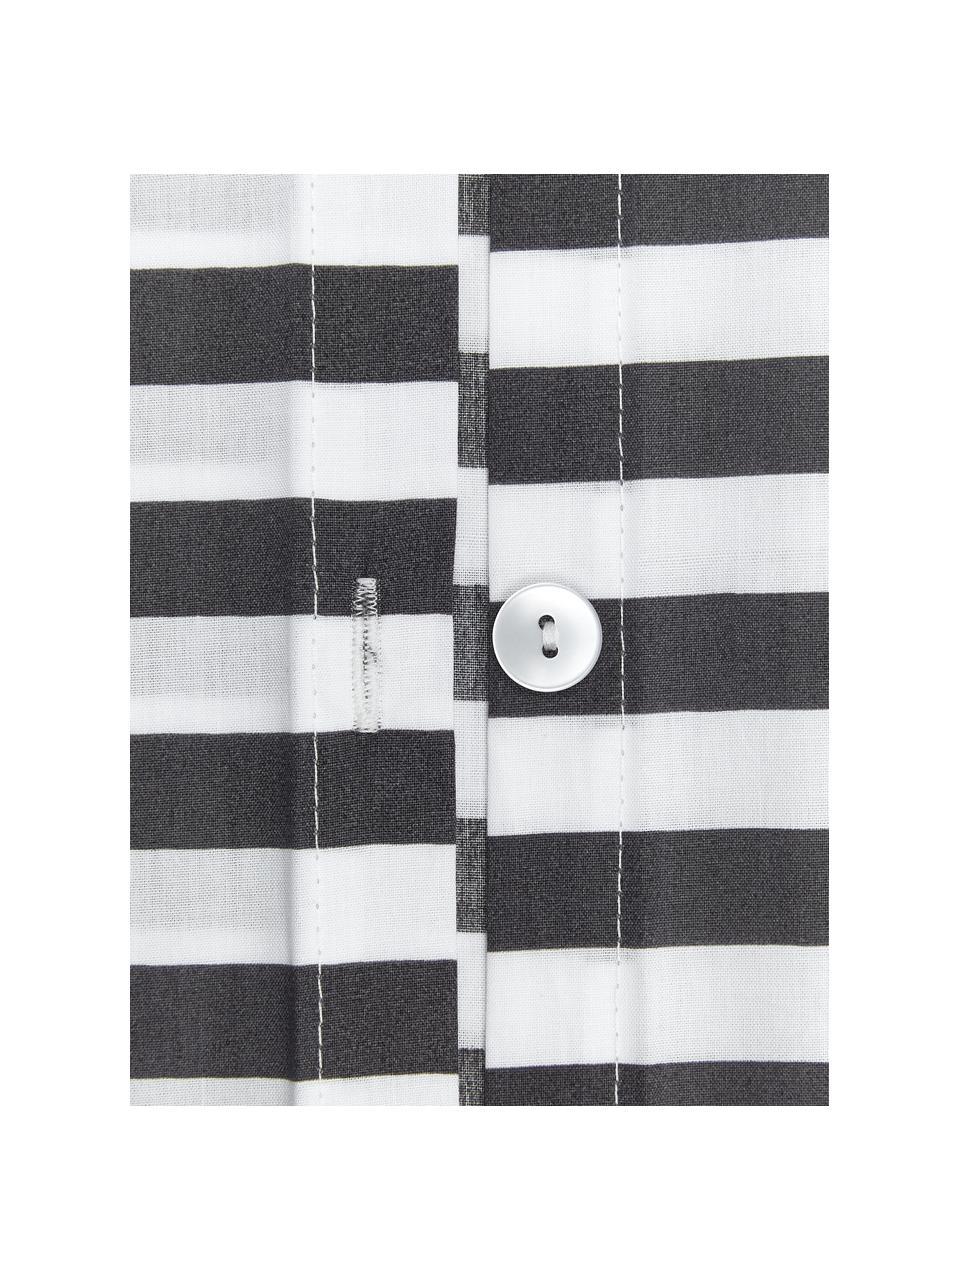 Gestreifte Baumwollperkal-Kopfkissenbezüge Yuliya, 2 Stück, Webart: Perkal Fadendichte 180 TC, Dunkelgrau, Weiß, 40 x 80 cm